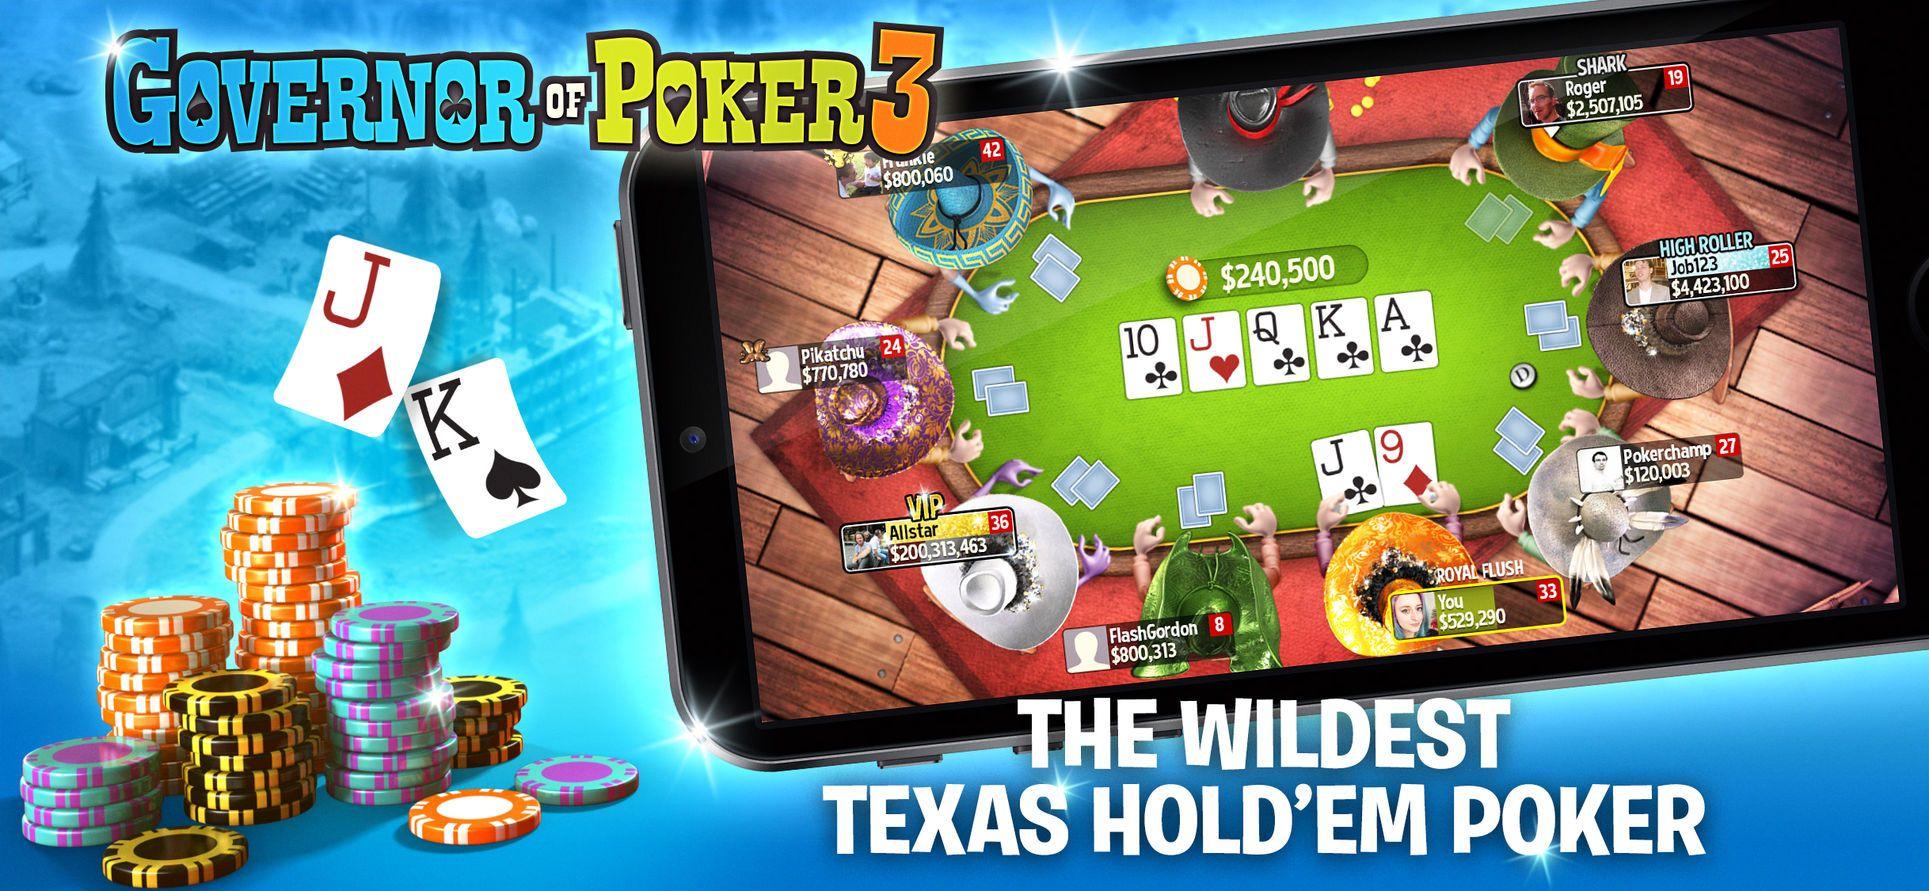 Governor of poker 3 online casinoholdingcardios